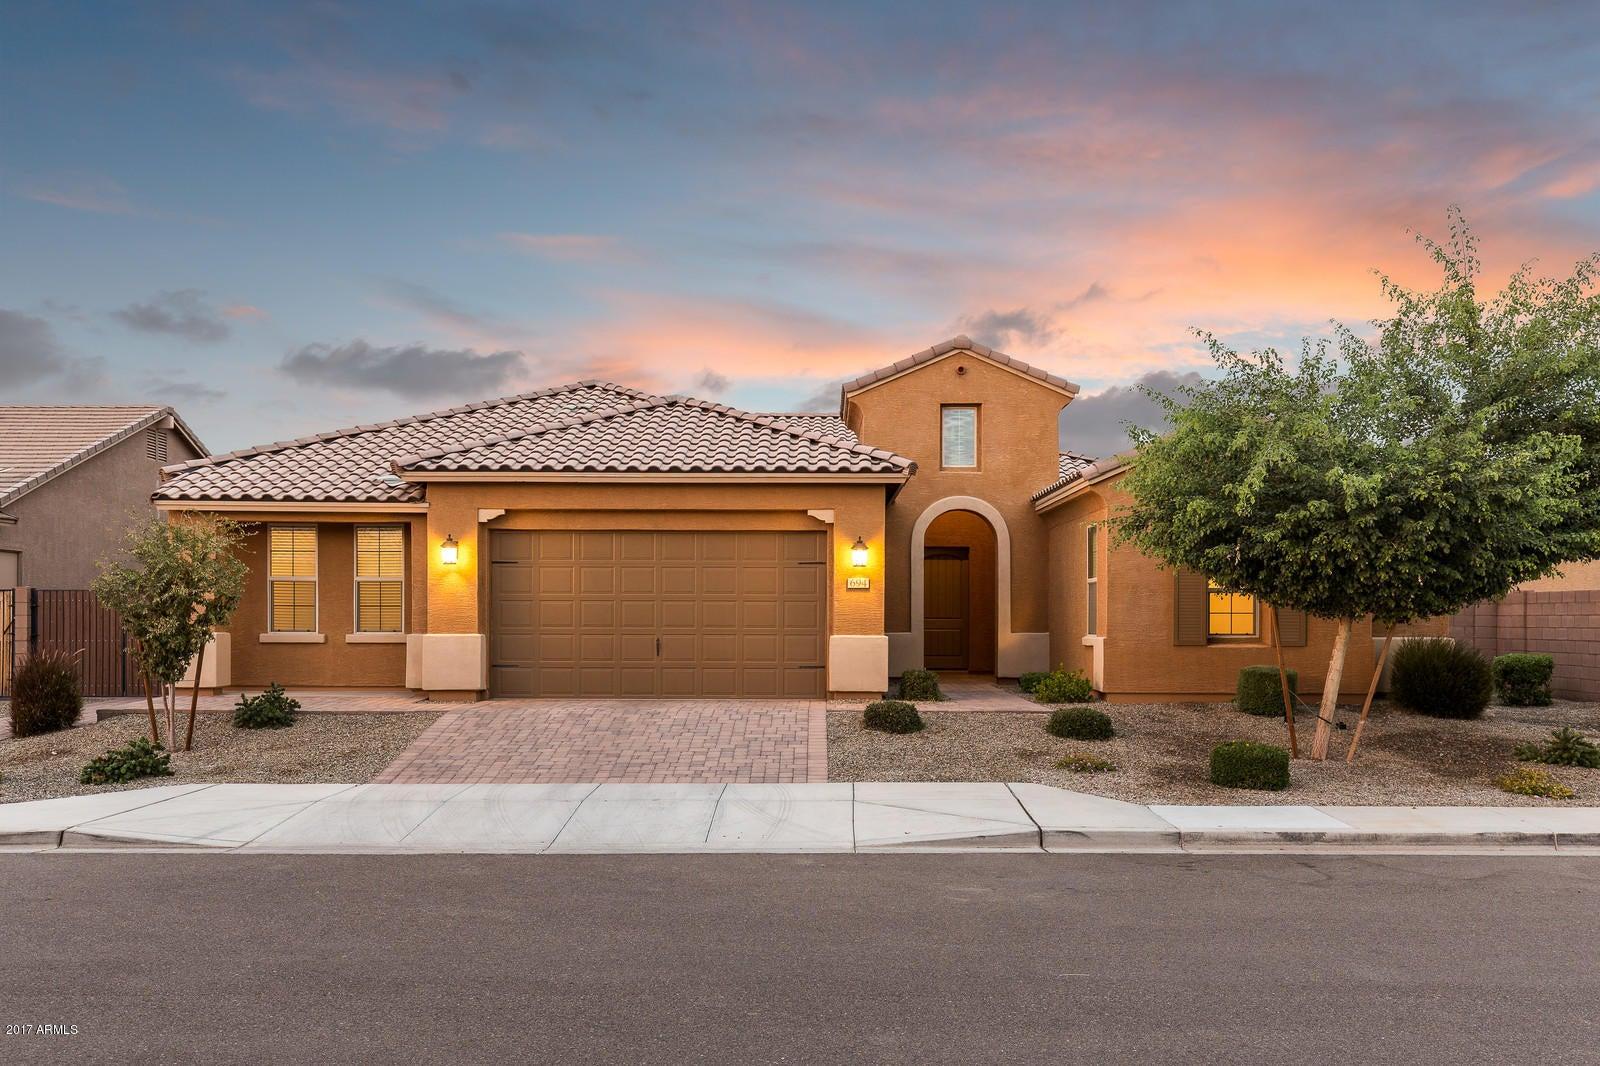 694 W Mulberry Drive, Chandler, AZ 85286